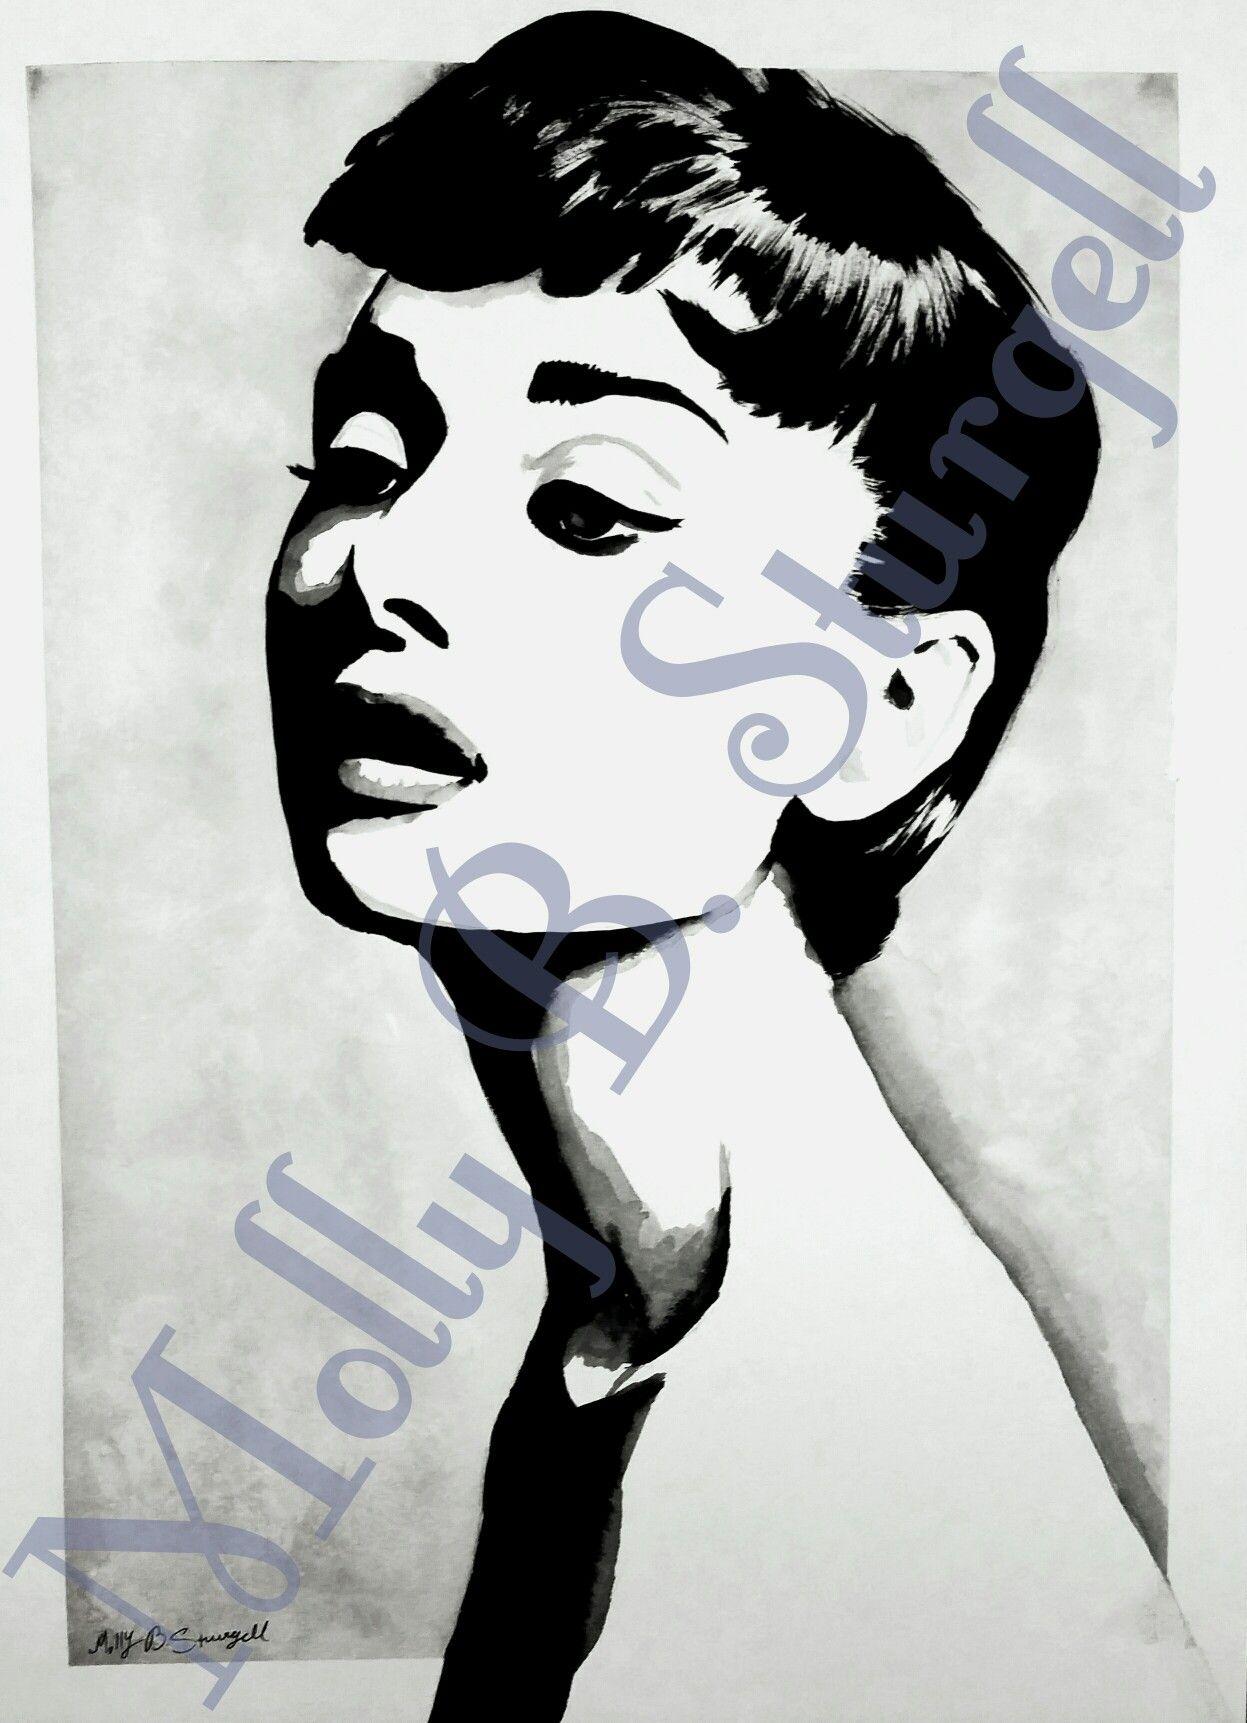 Audrey Hepburn watercolor portrait art  by Molly B. Sturgell